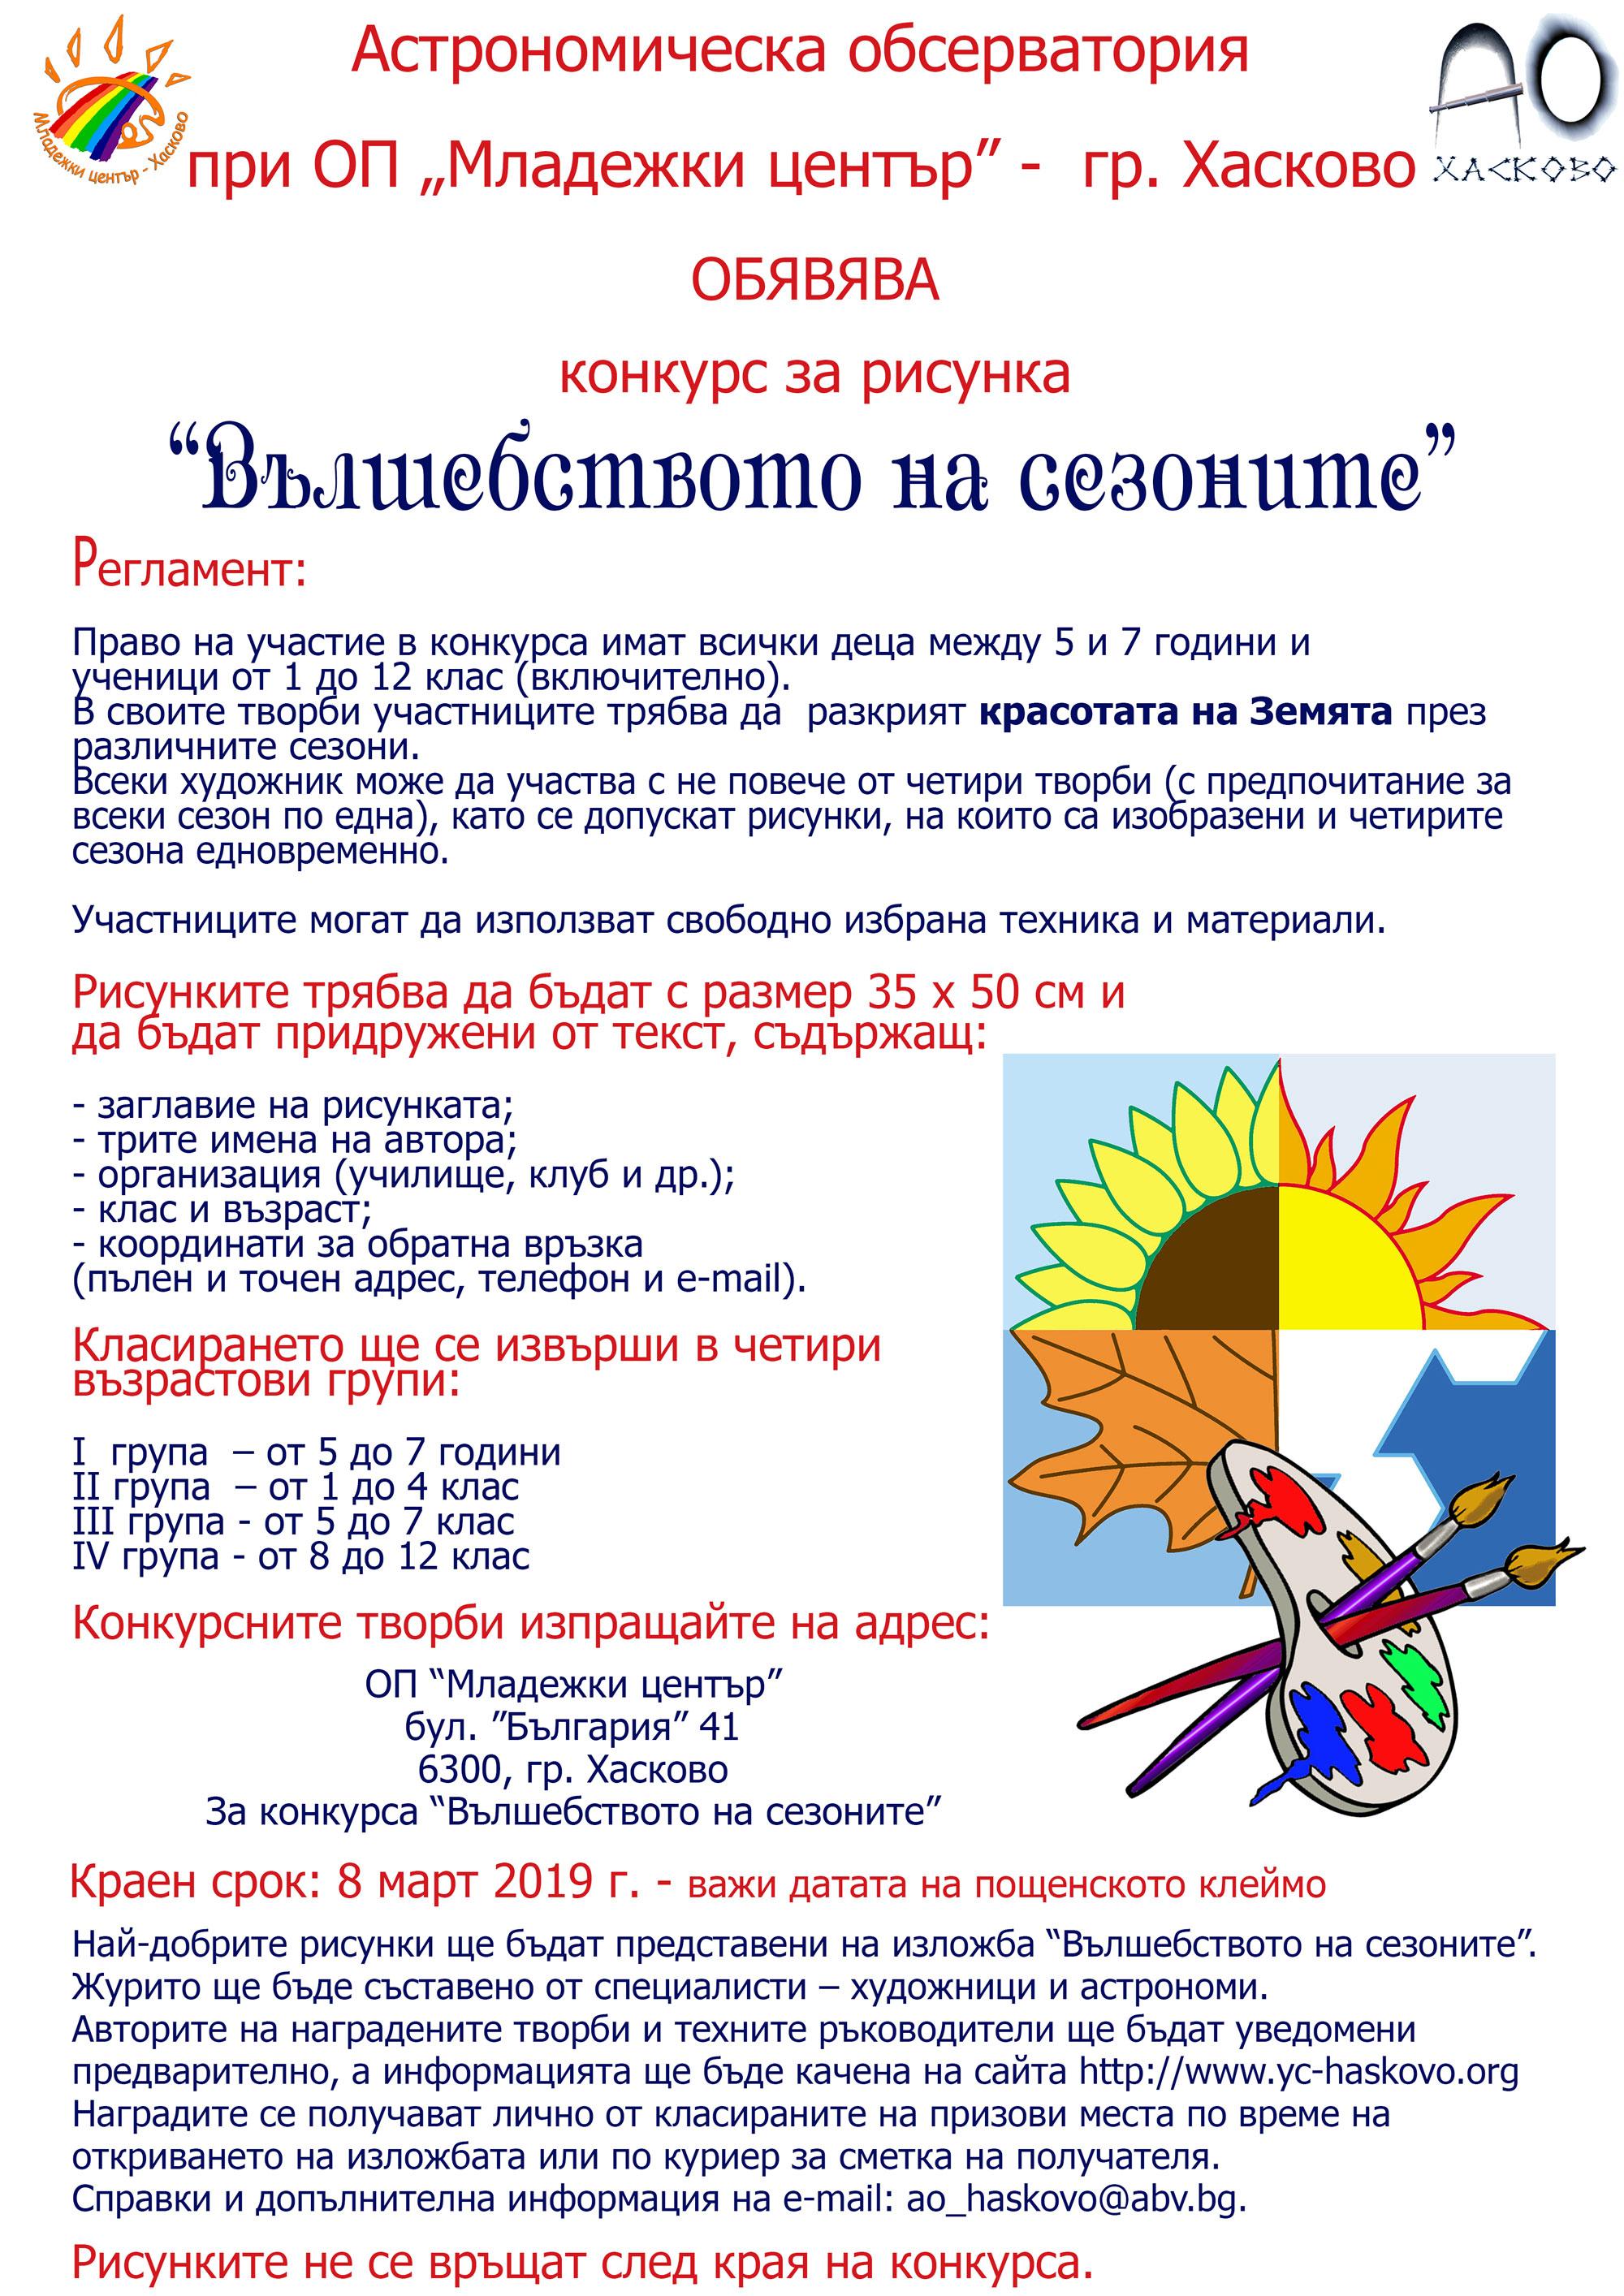 konkurs_risunka_2019-www